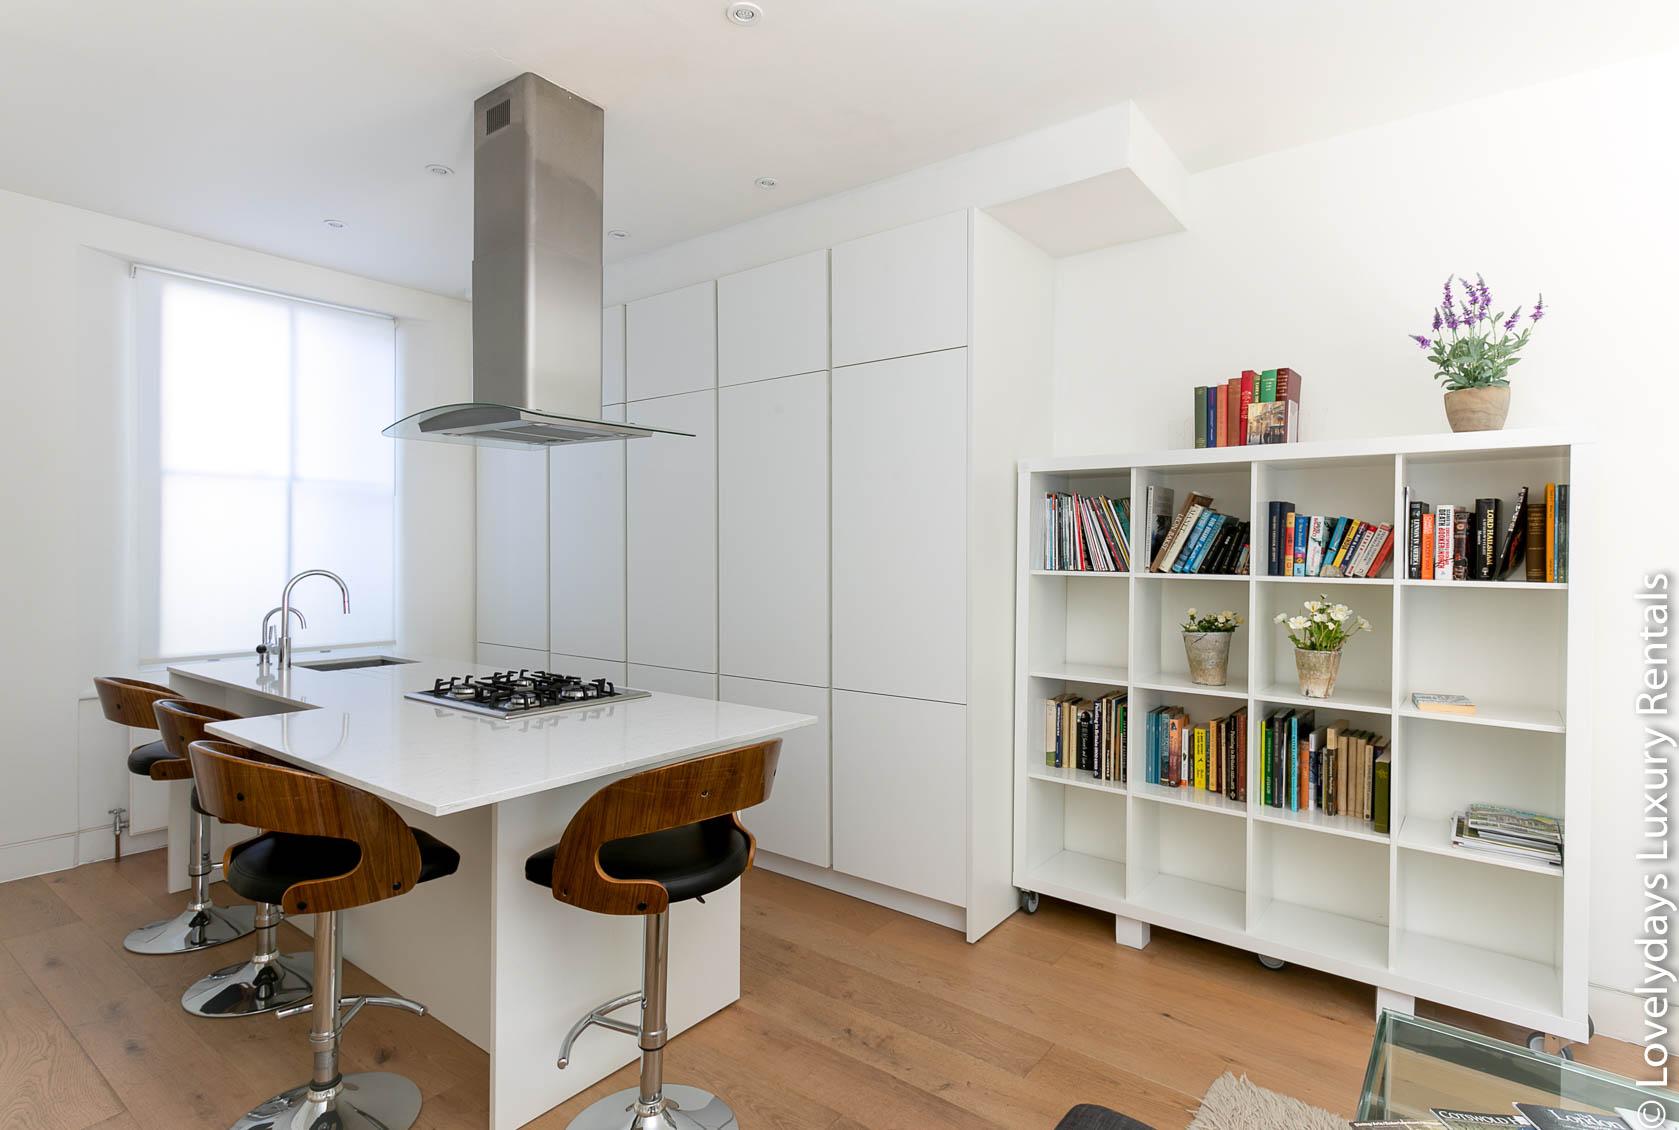 Lovelydays luxury service apartment rental - London - Fitzrovia - Foley Street - Lovelysuite - 2 bedrooms - 2 bathrooms - Luxury kitchen - 89ca0b31ccaa - Lovelydays